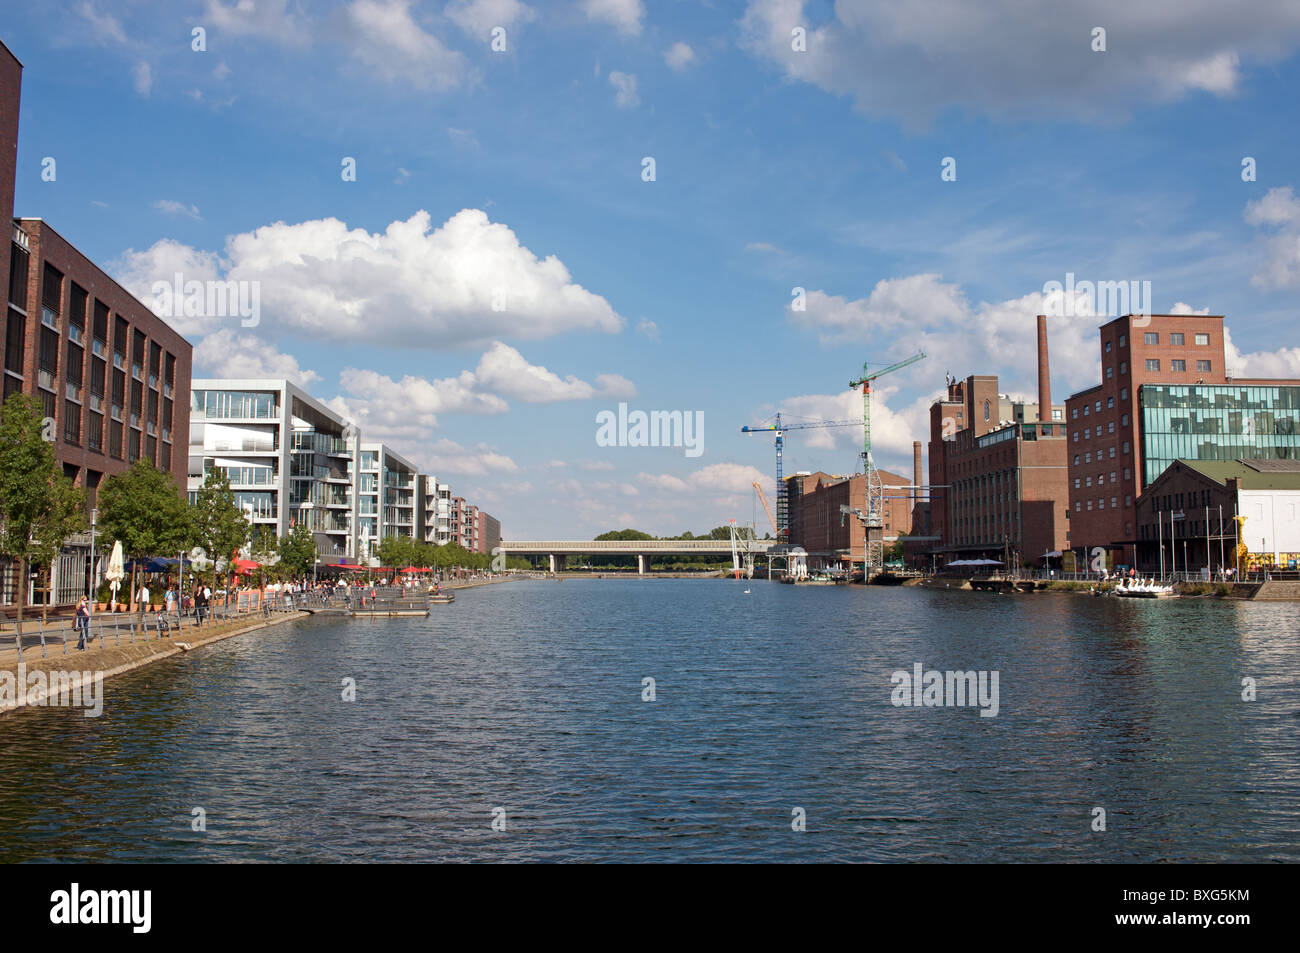 Innenhafen, Duisburg, Germany. - Stock Image